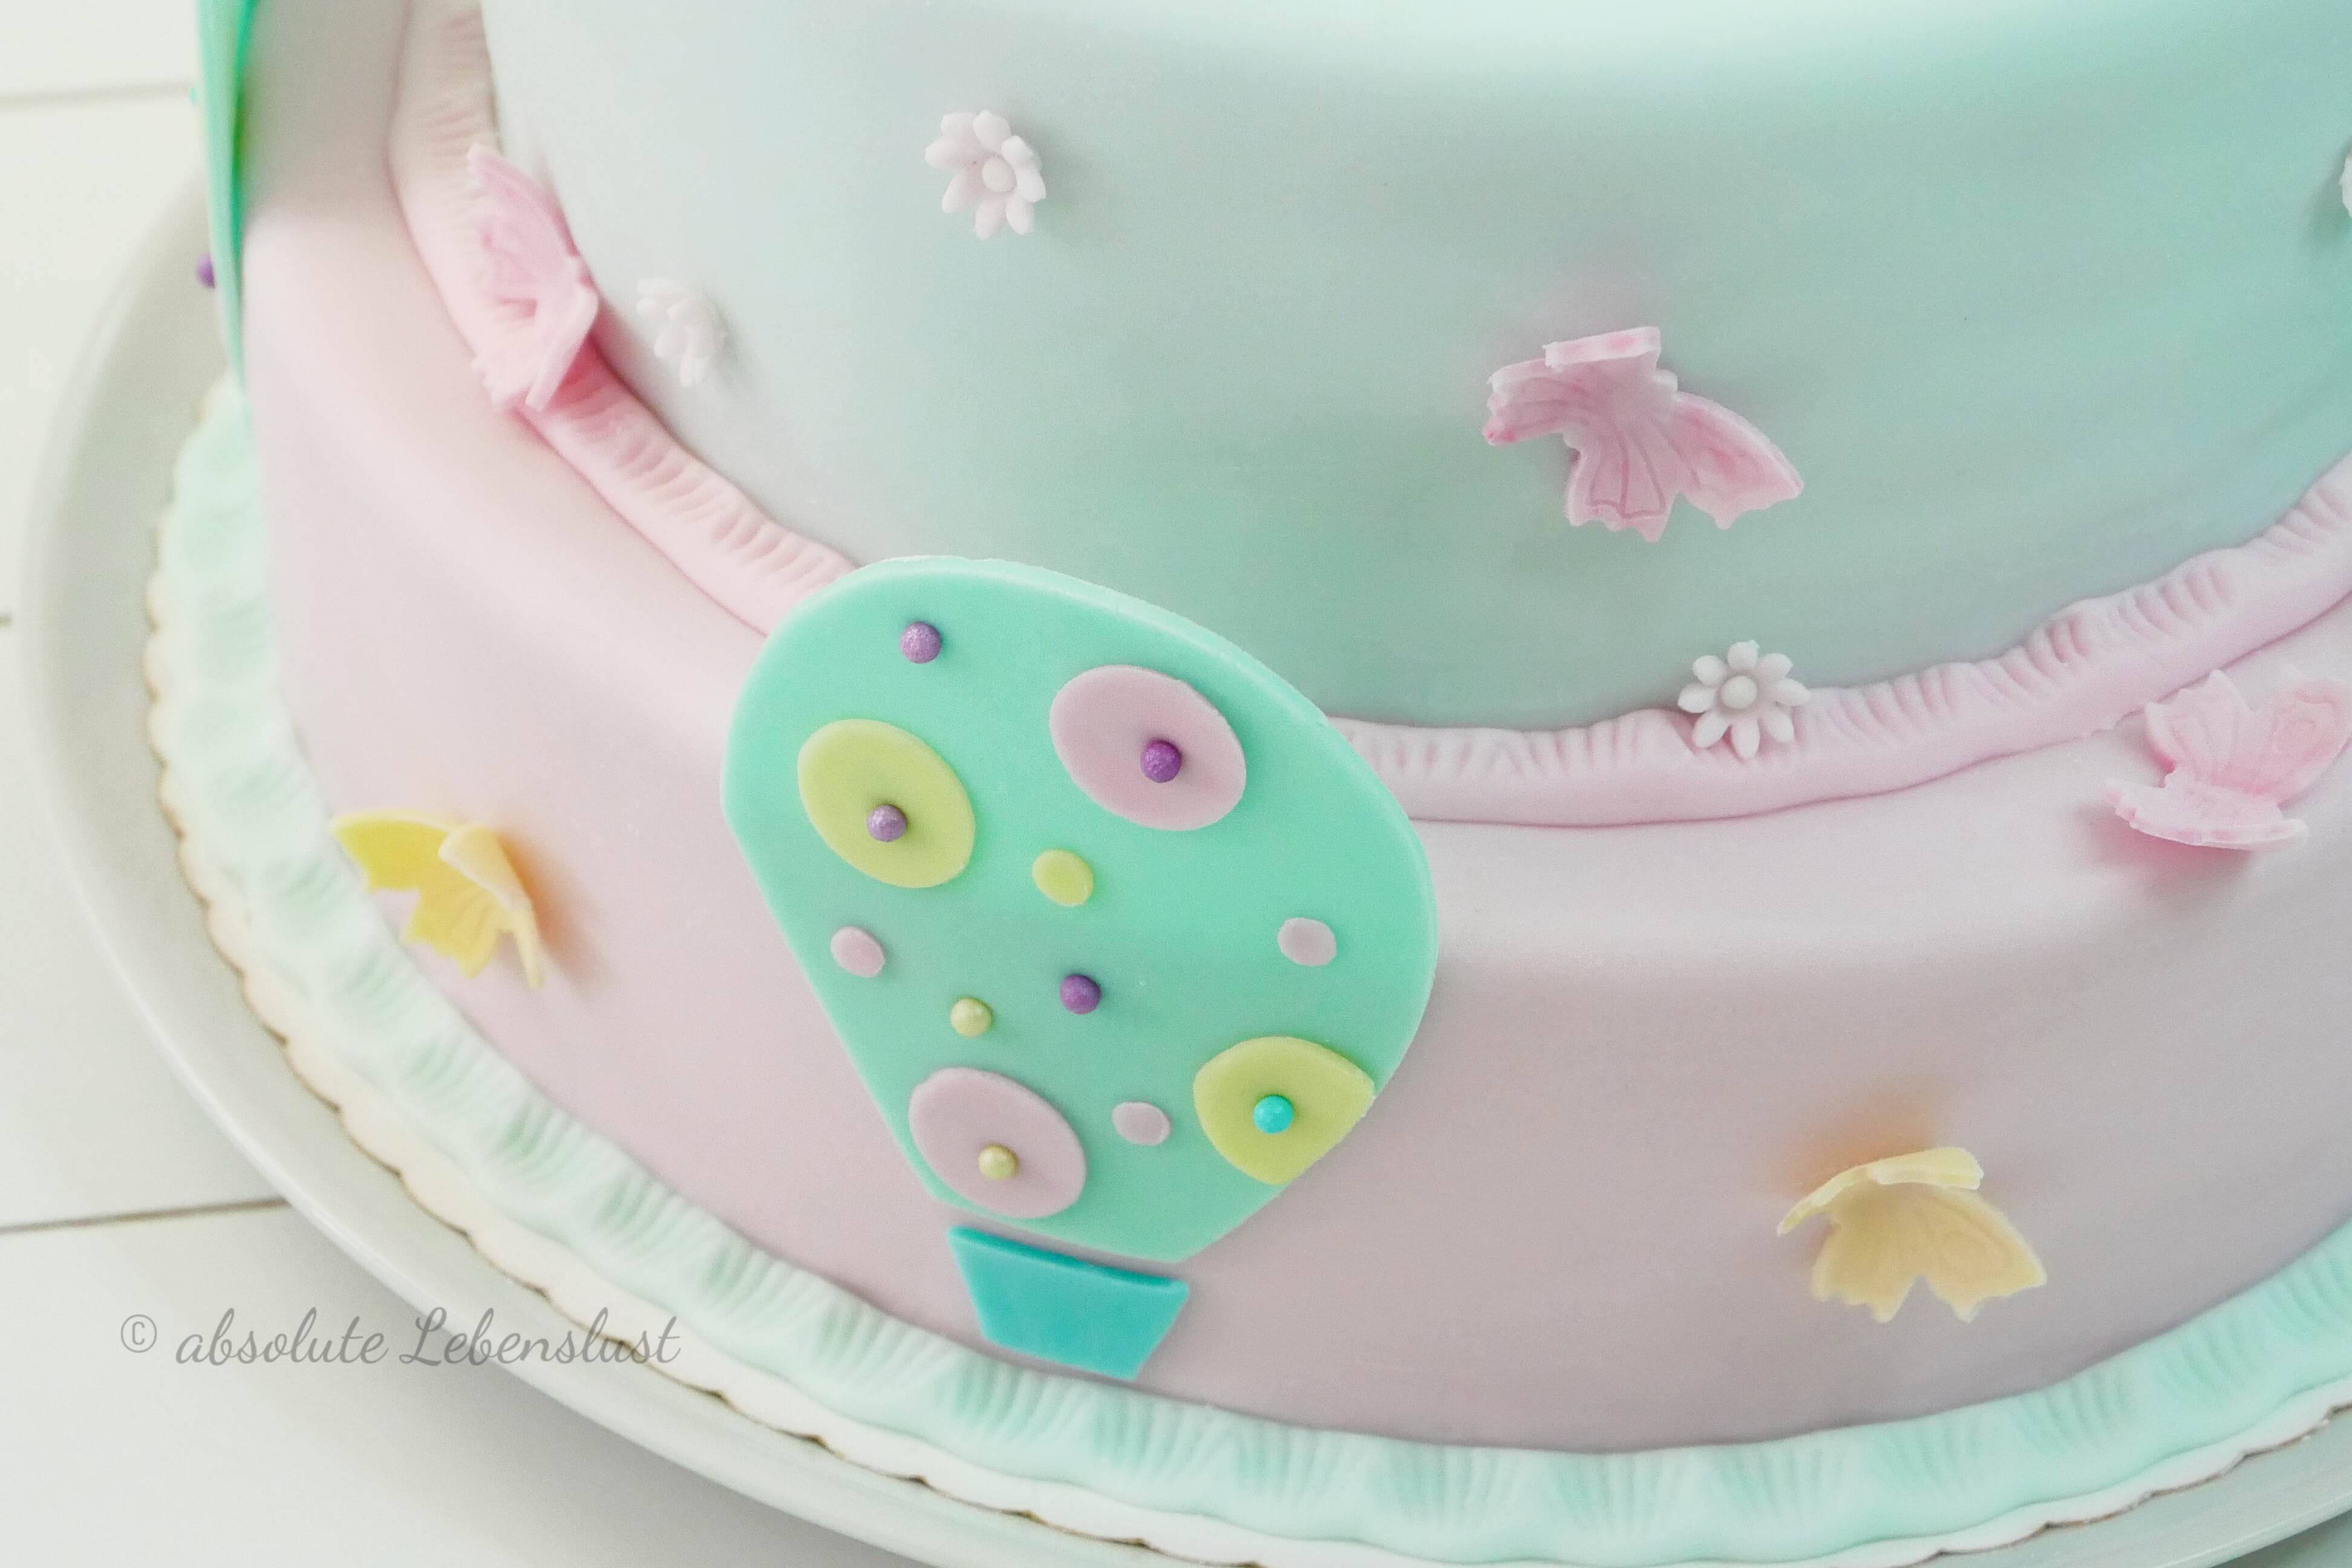 ballon torte, heißluftballon torte, balloon cake, backen, motivtorte selber machen, motivtorte backen